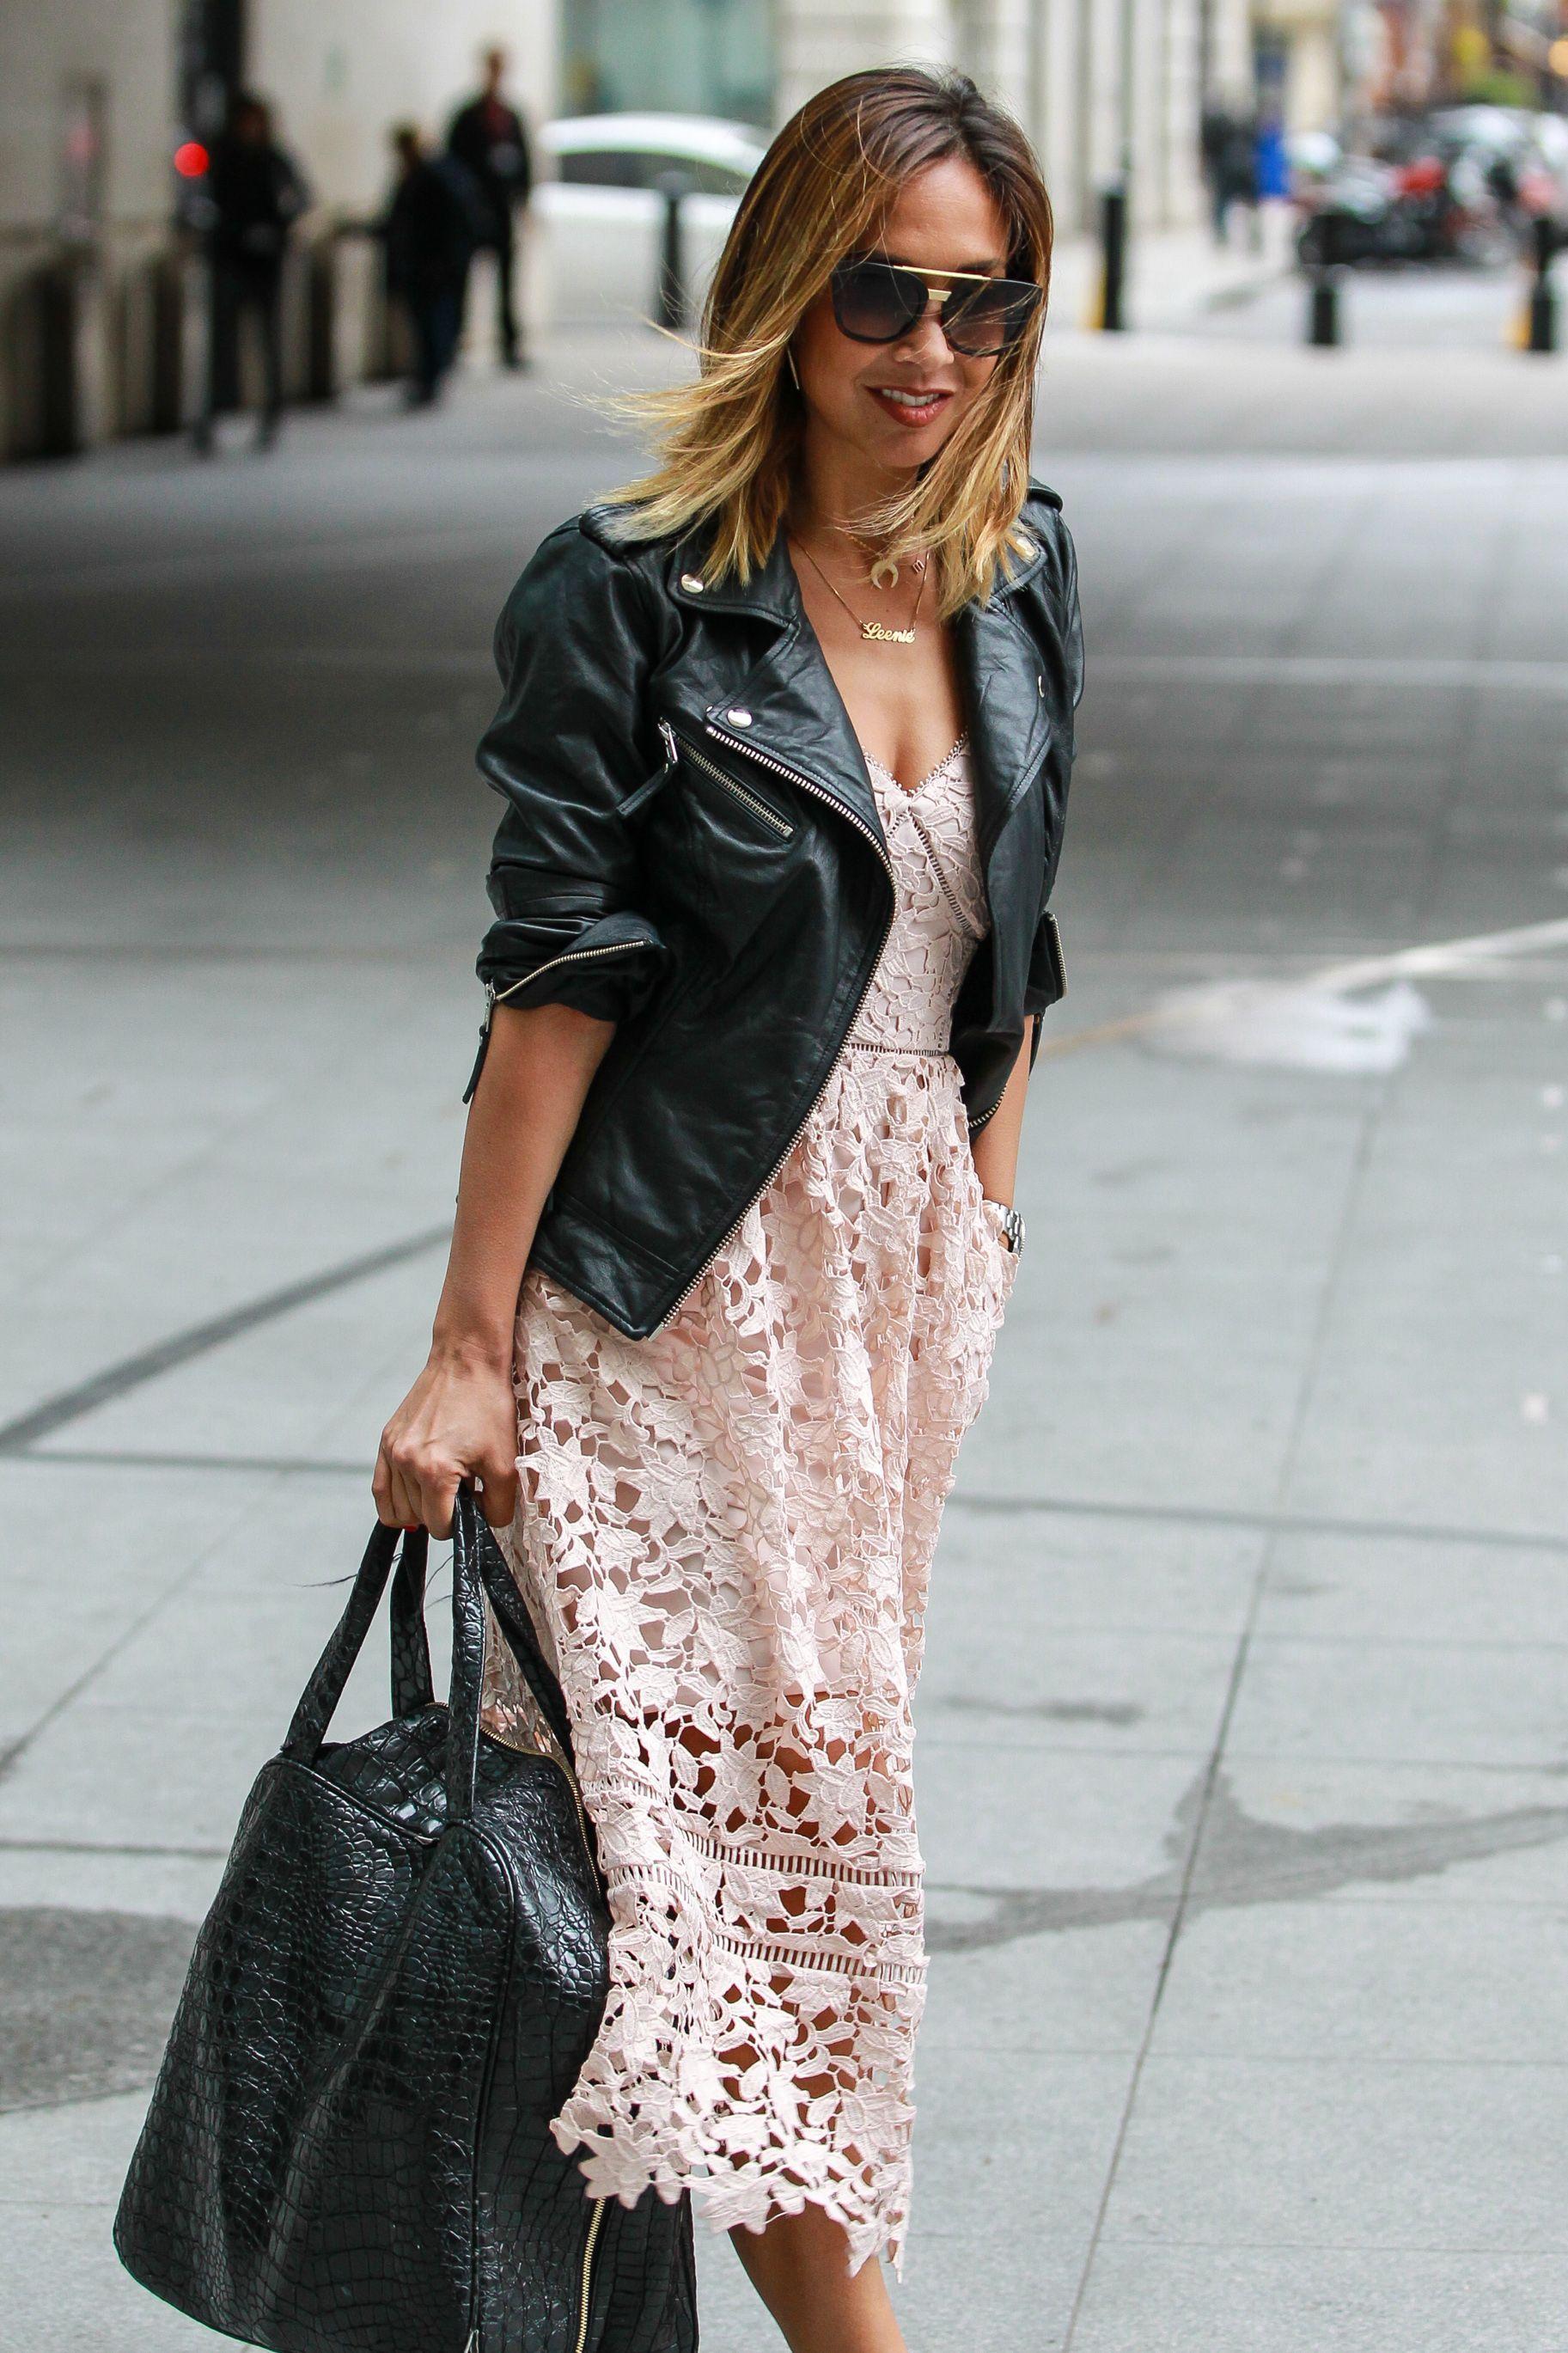 e01b7999aa Myleene Klass at BBC Studios | Fashion | Fashion, Fashion outfits ...